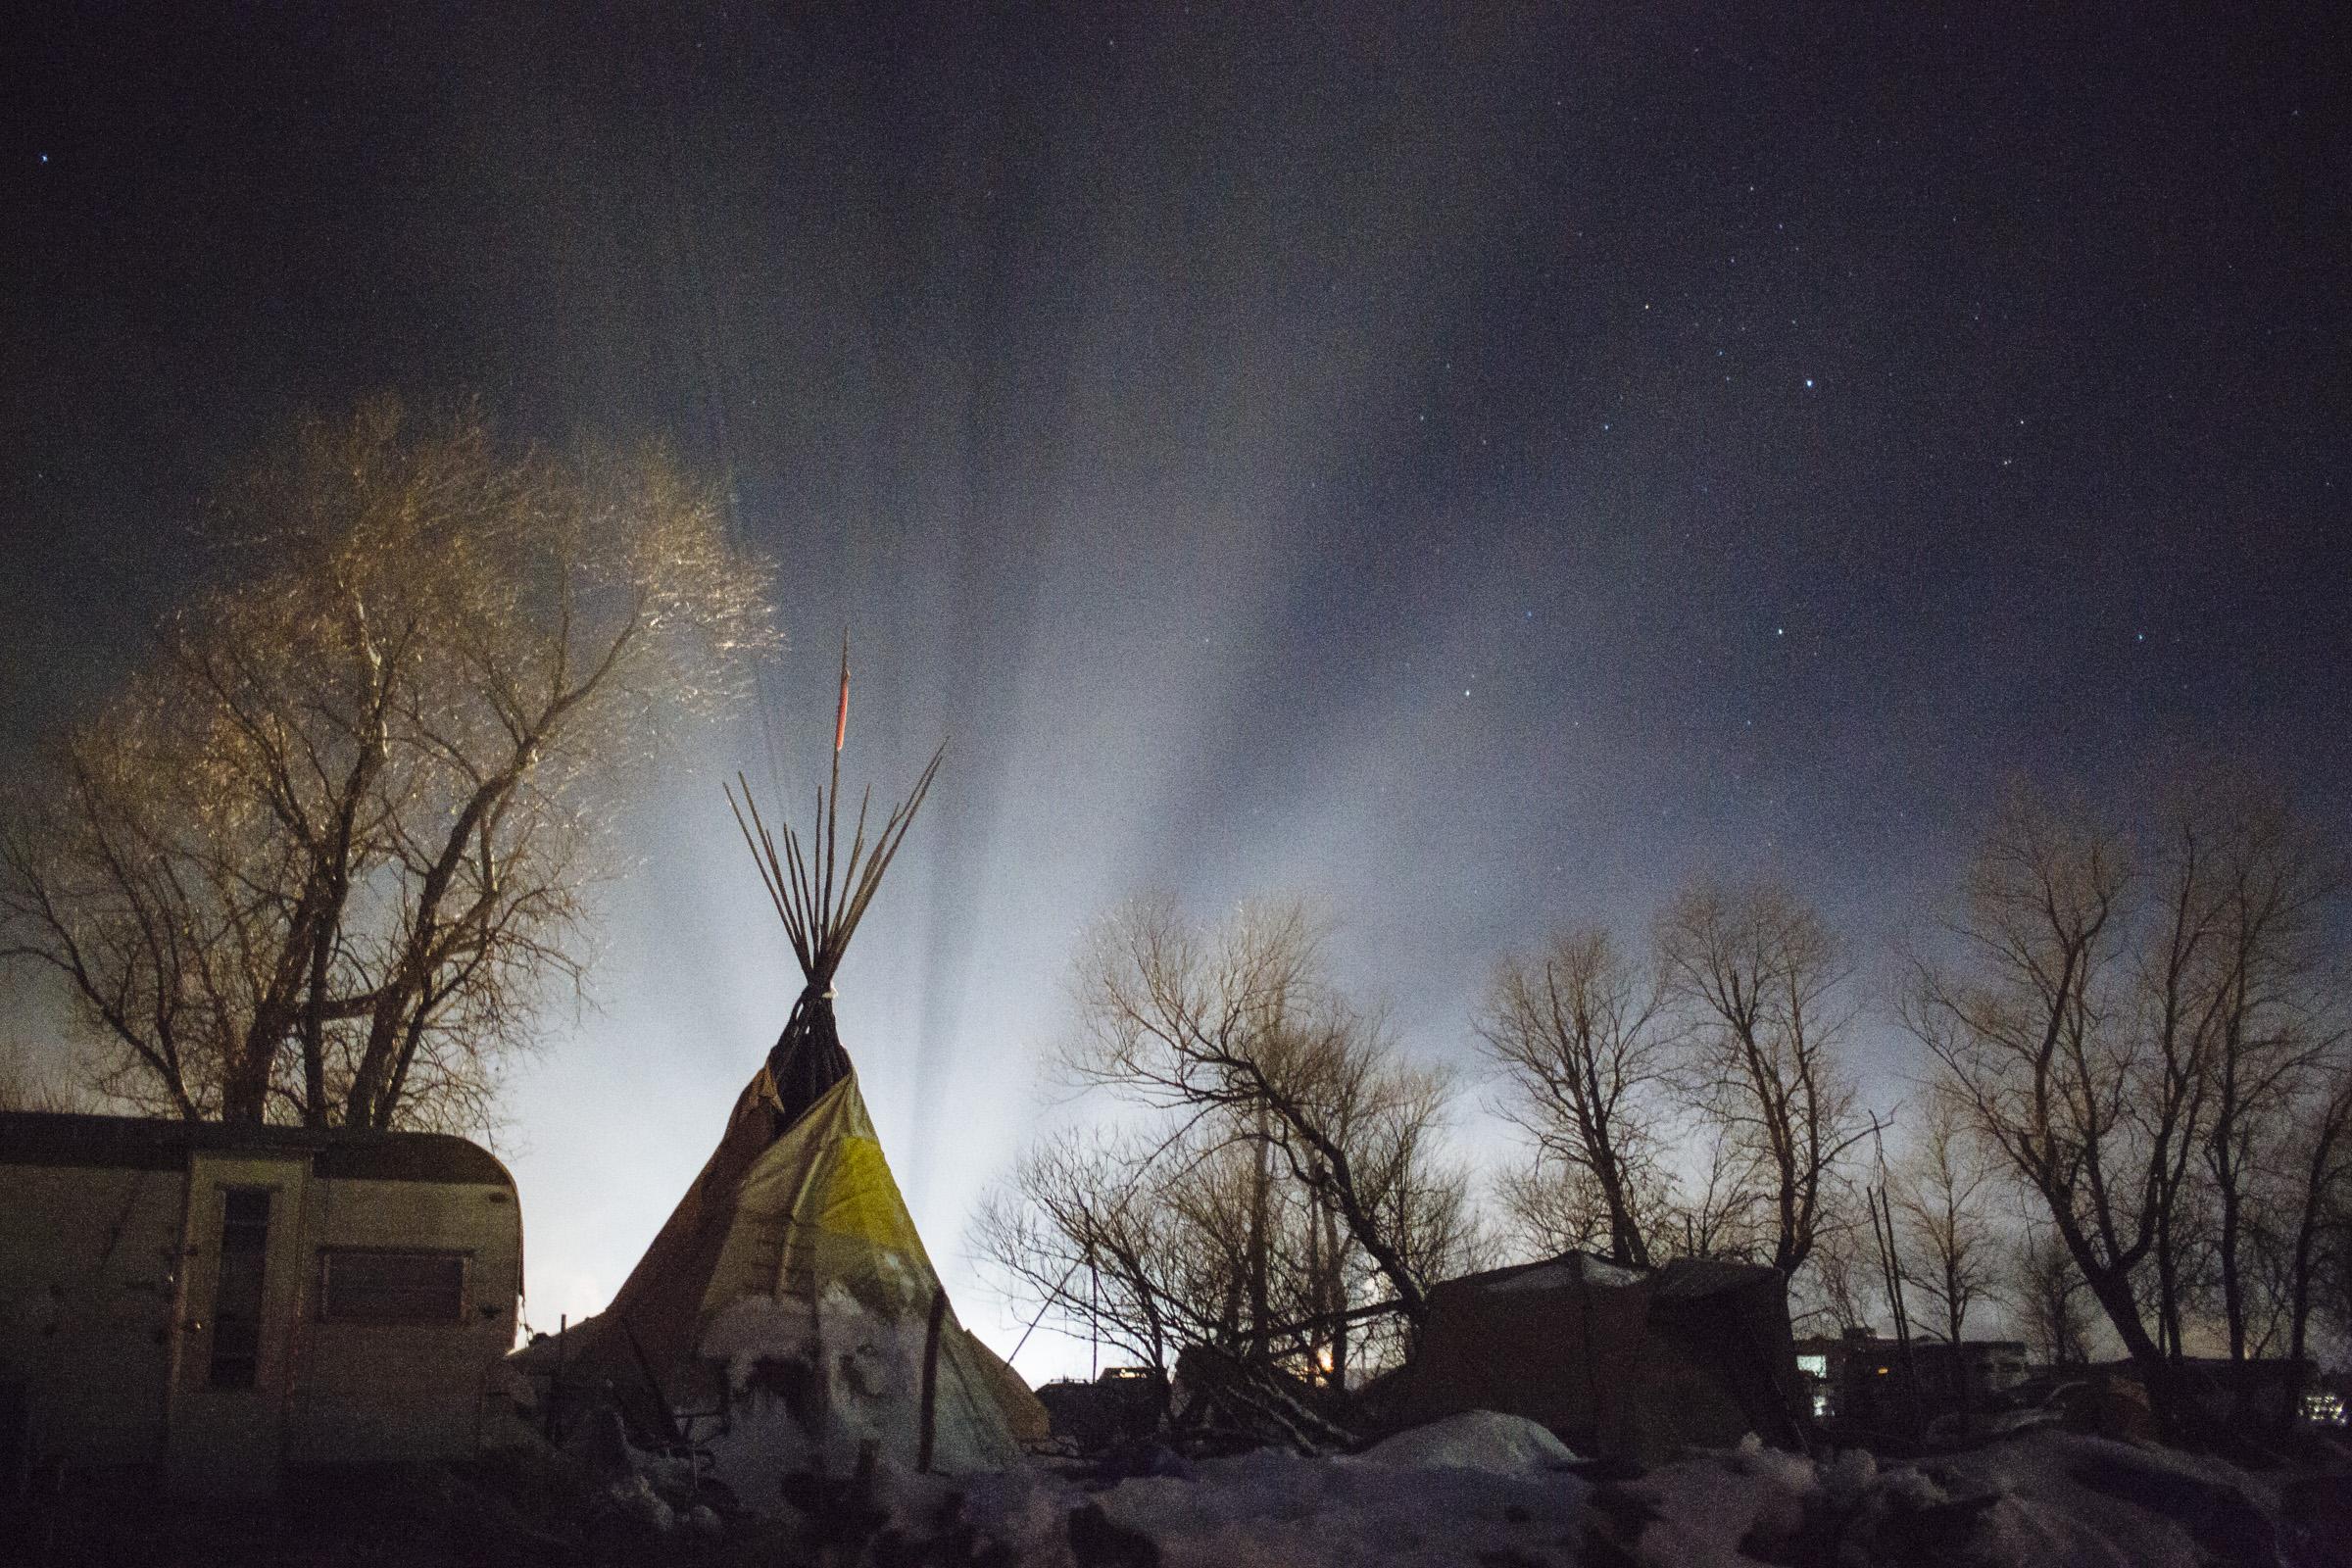 Car headlights illuminate fog surrounding a tepee at the Oceti Sakowin Camp near Cannon Ball, North Dakota on Sunday, Dec. 4, 2016. (Photo by Angus Mordant/GroundTruth)